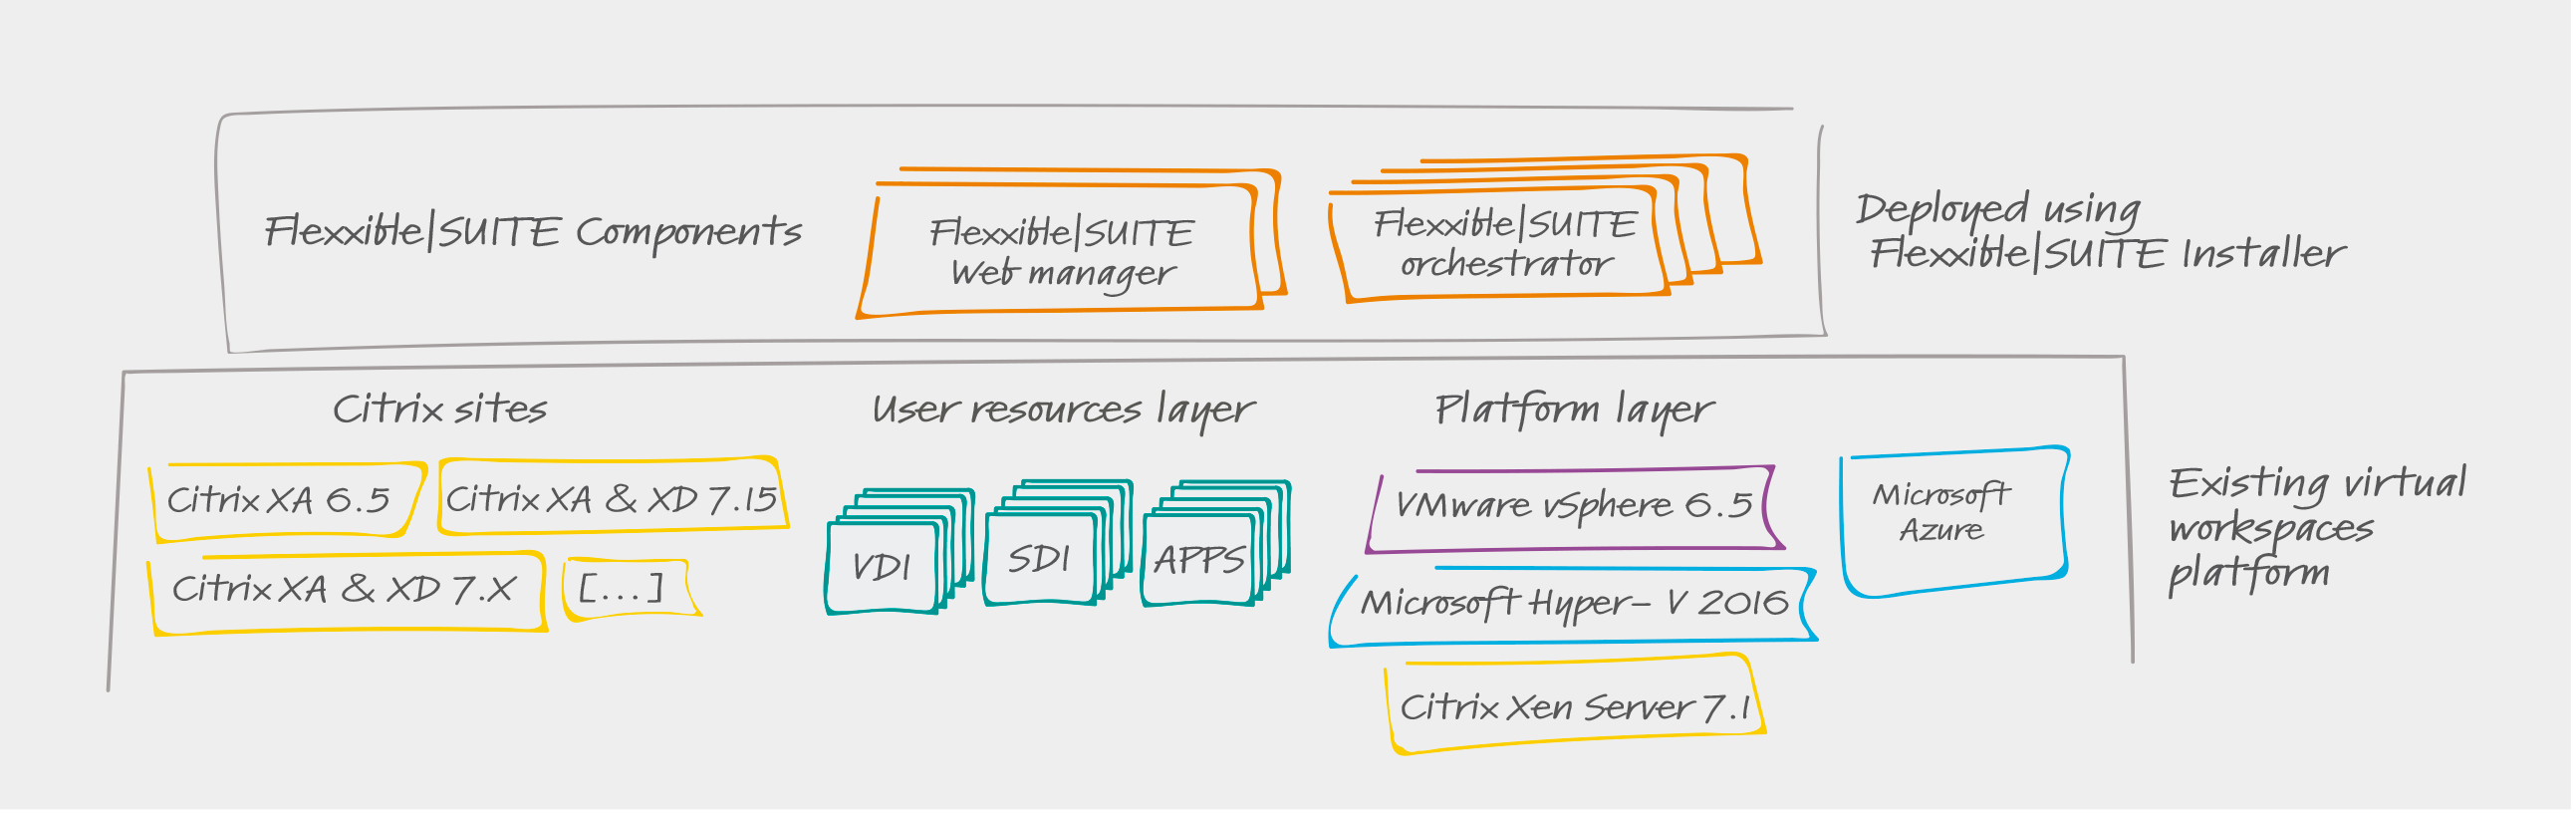 Software Suite for Citrix Virtual Workspaces by Flexxible IT